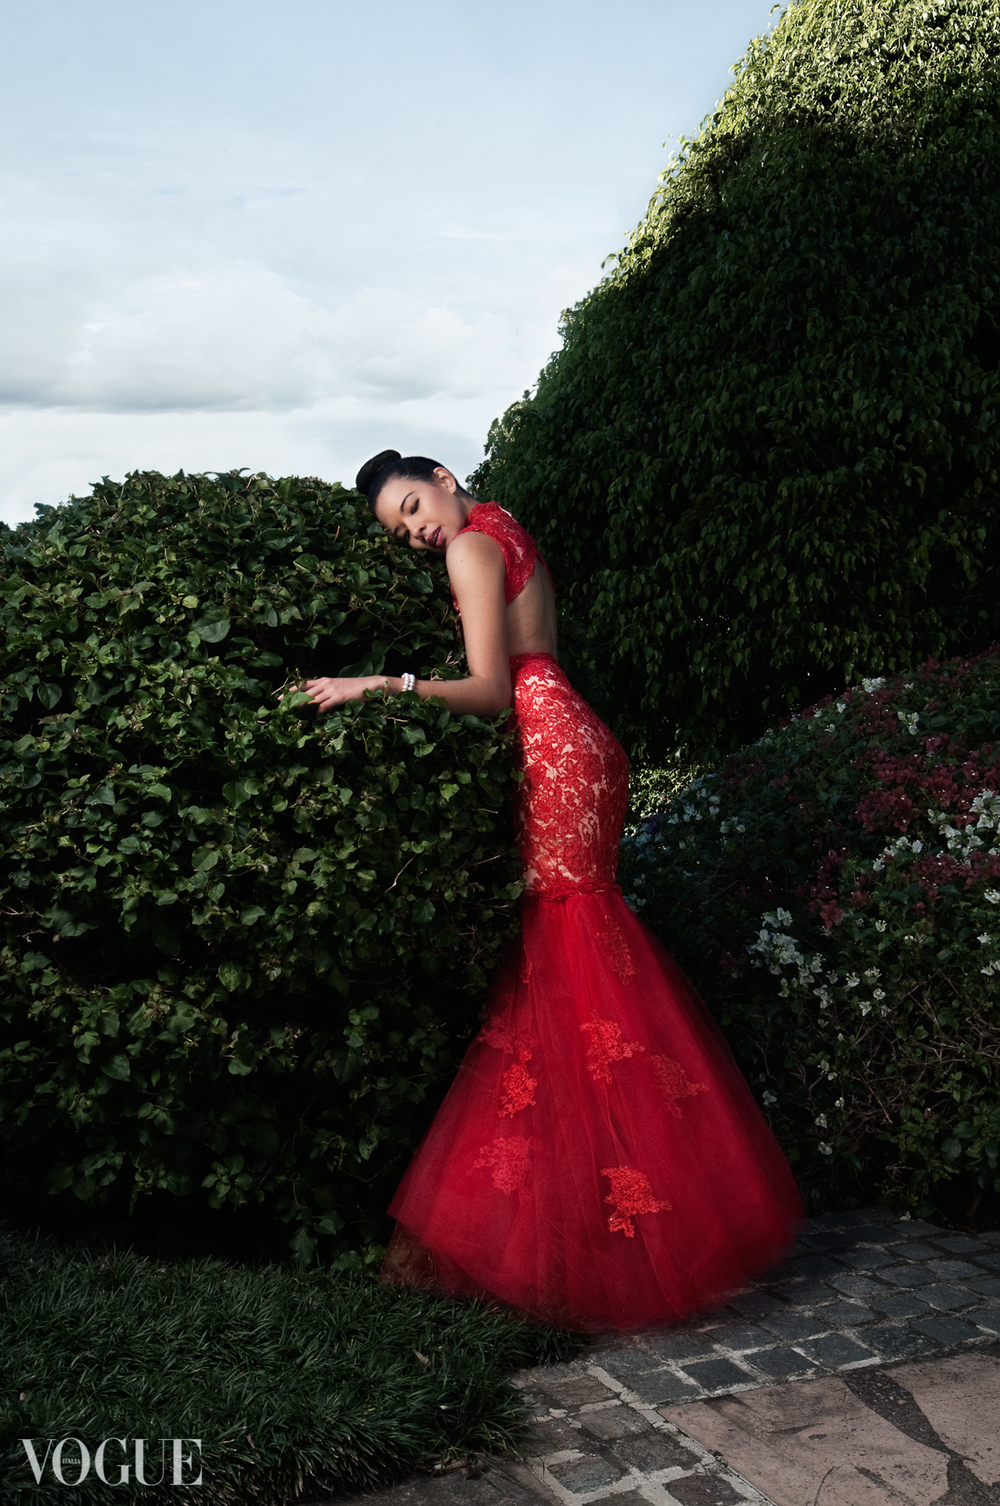 MeganPopelier_Vogue.jpg